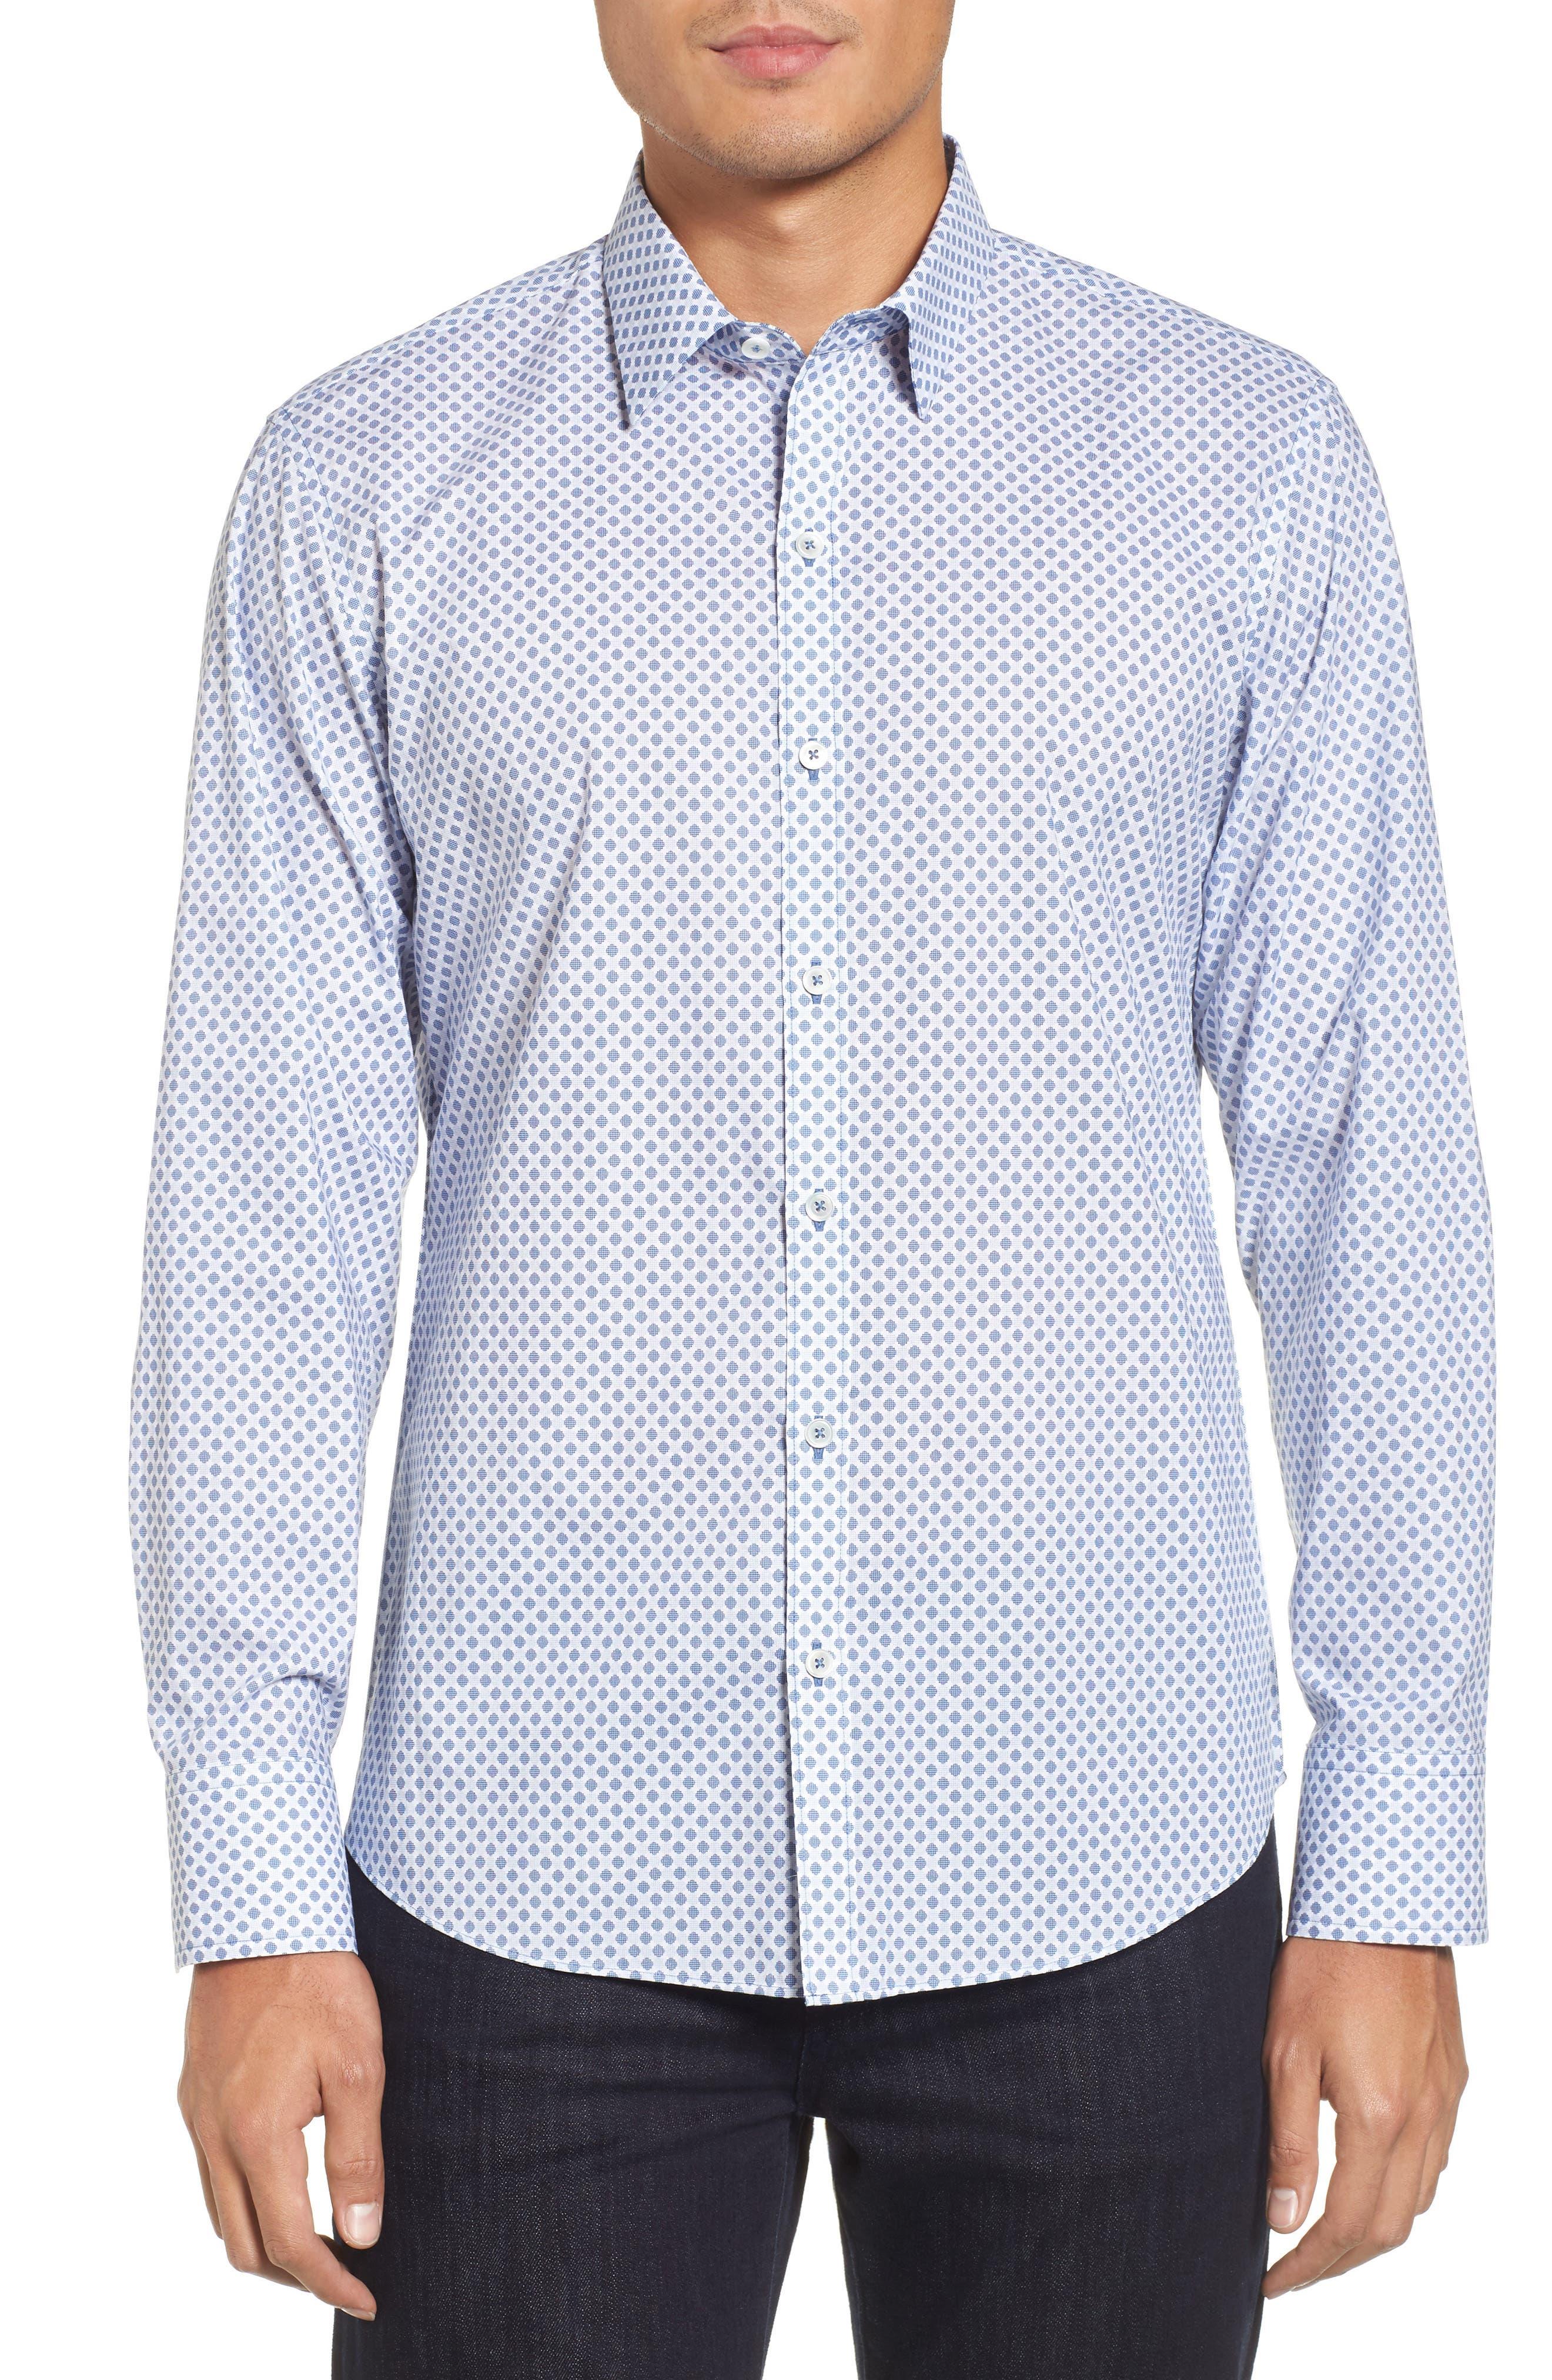 Obi Slim Fit Circle Print Sport Shirt,                             Main thumbnail 1, color,                             Navy